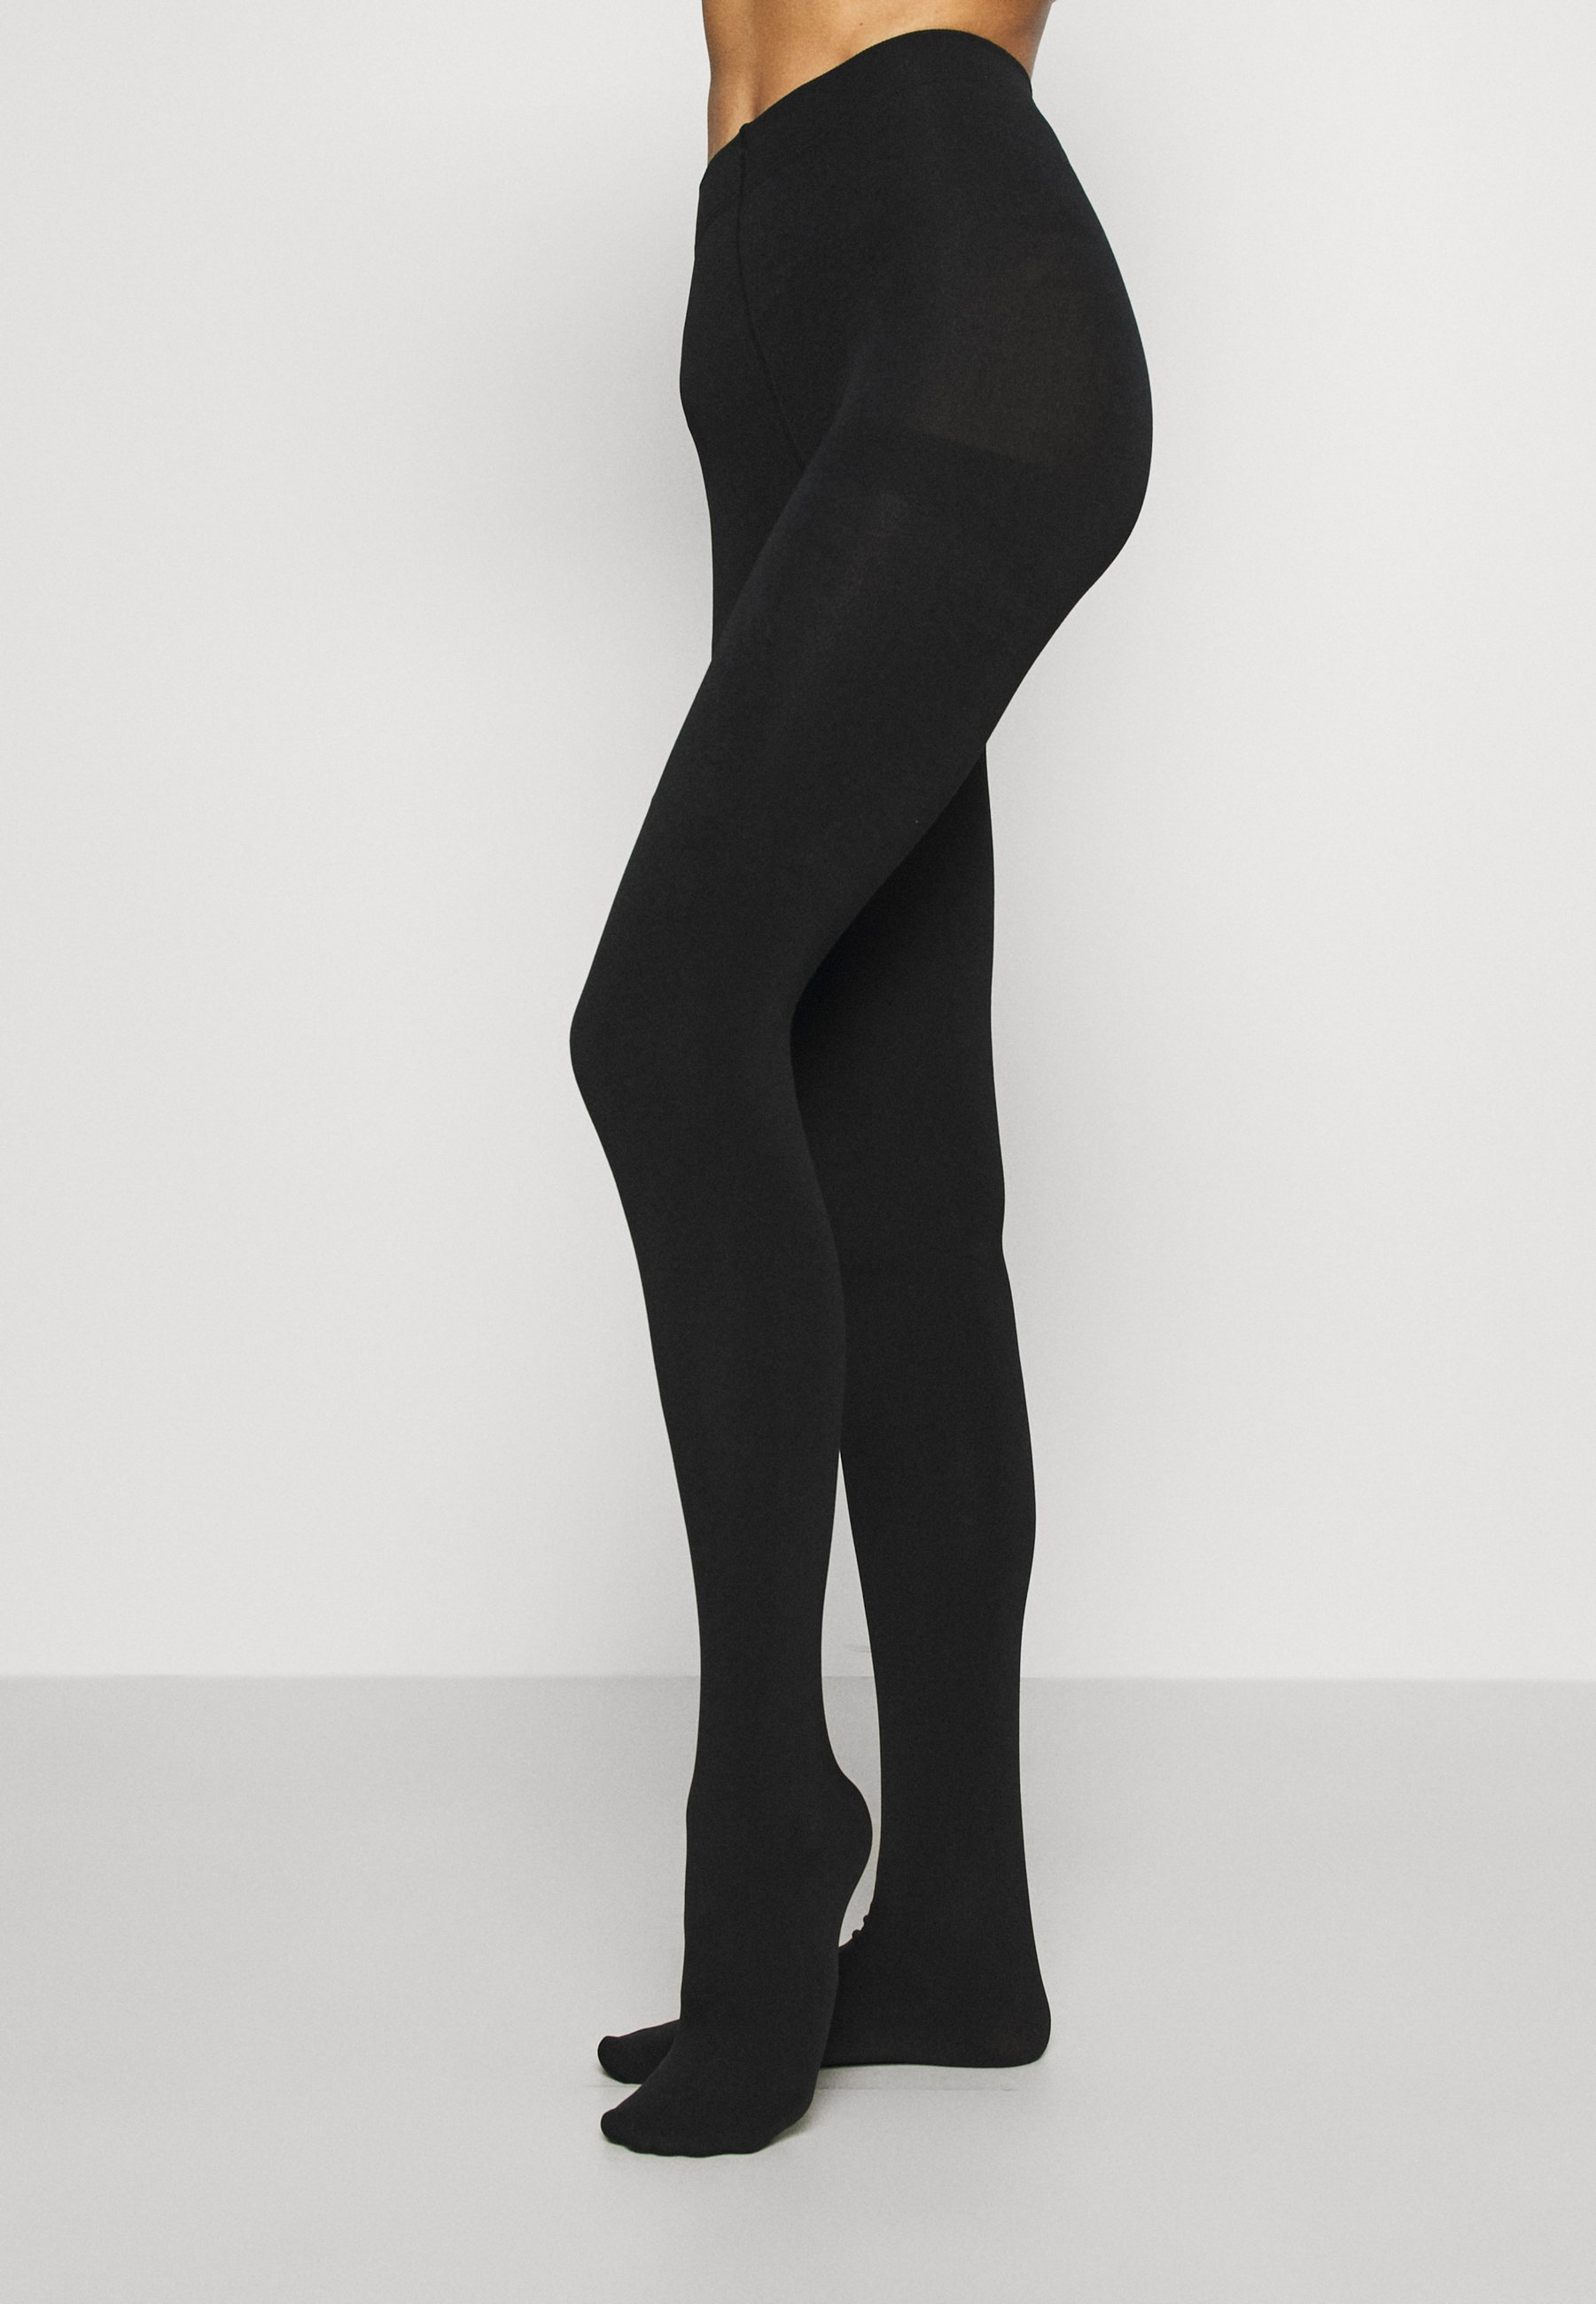 Femme POLAR TIGHT THERMO - Collants